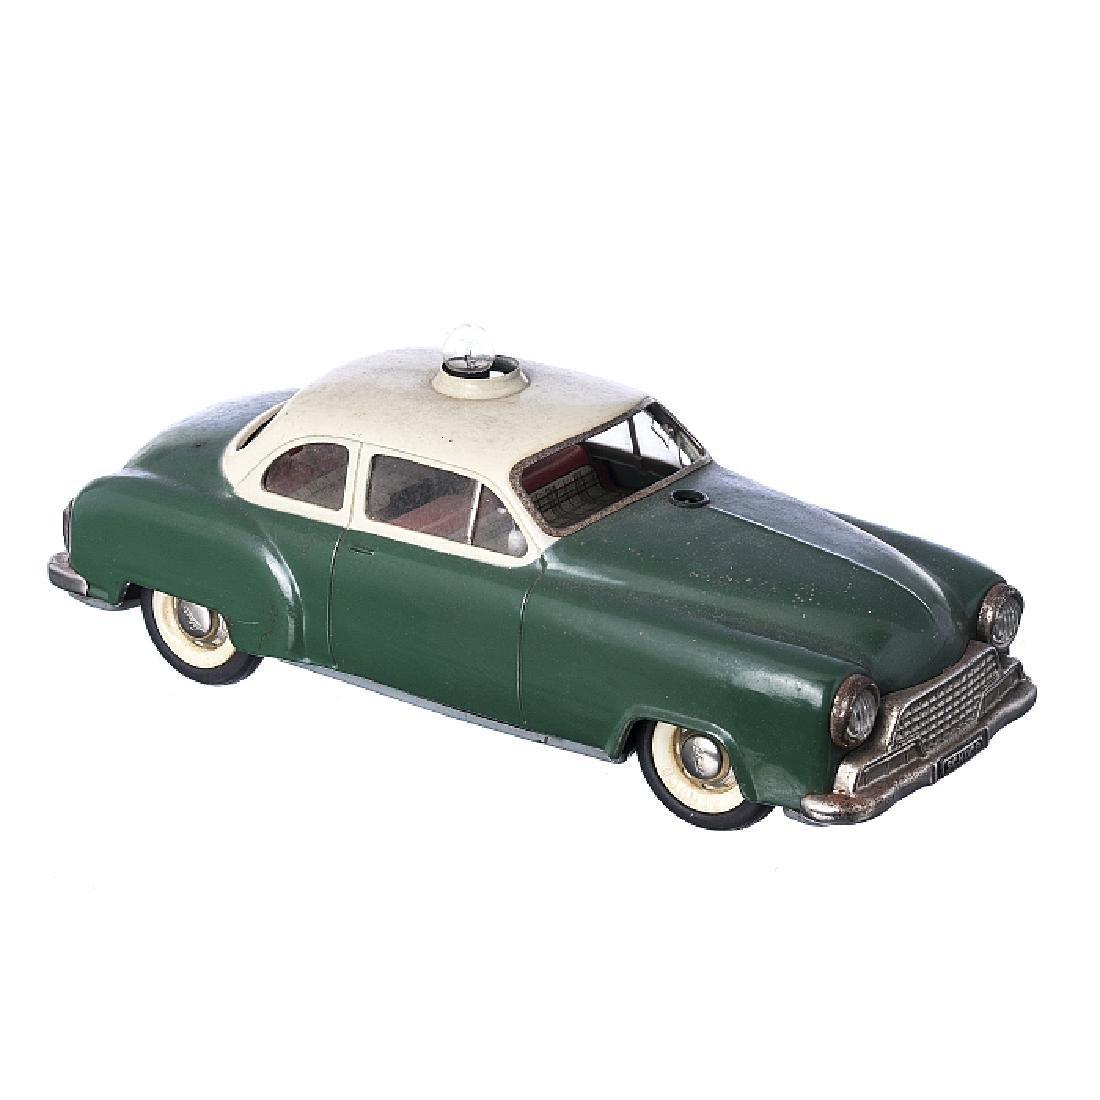 SCHUCO - Electro Alarm-Car toy